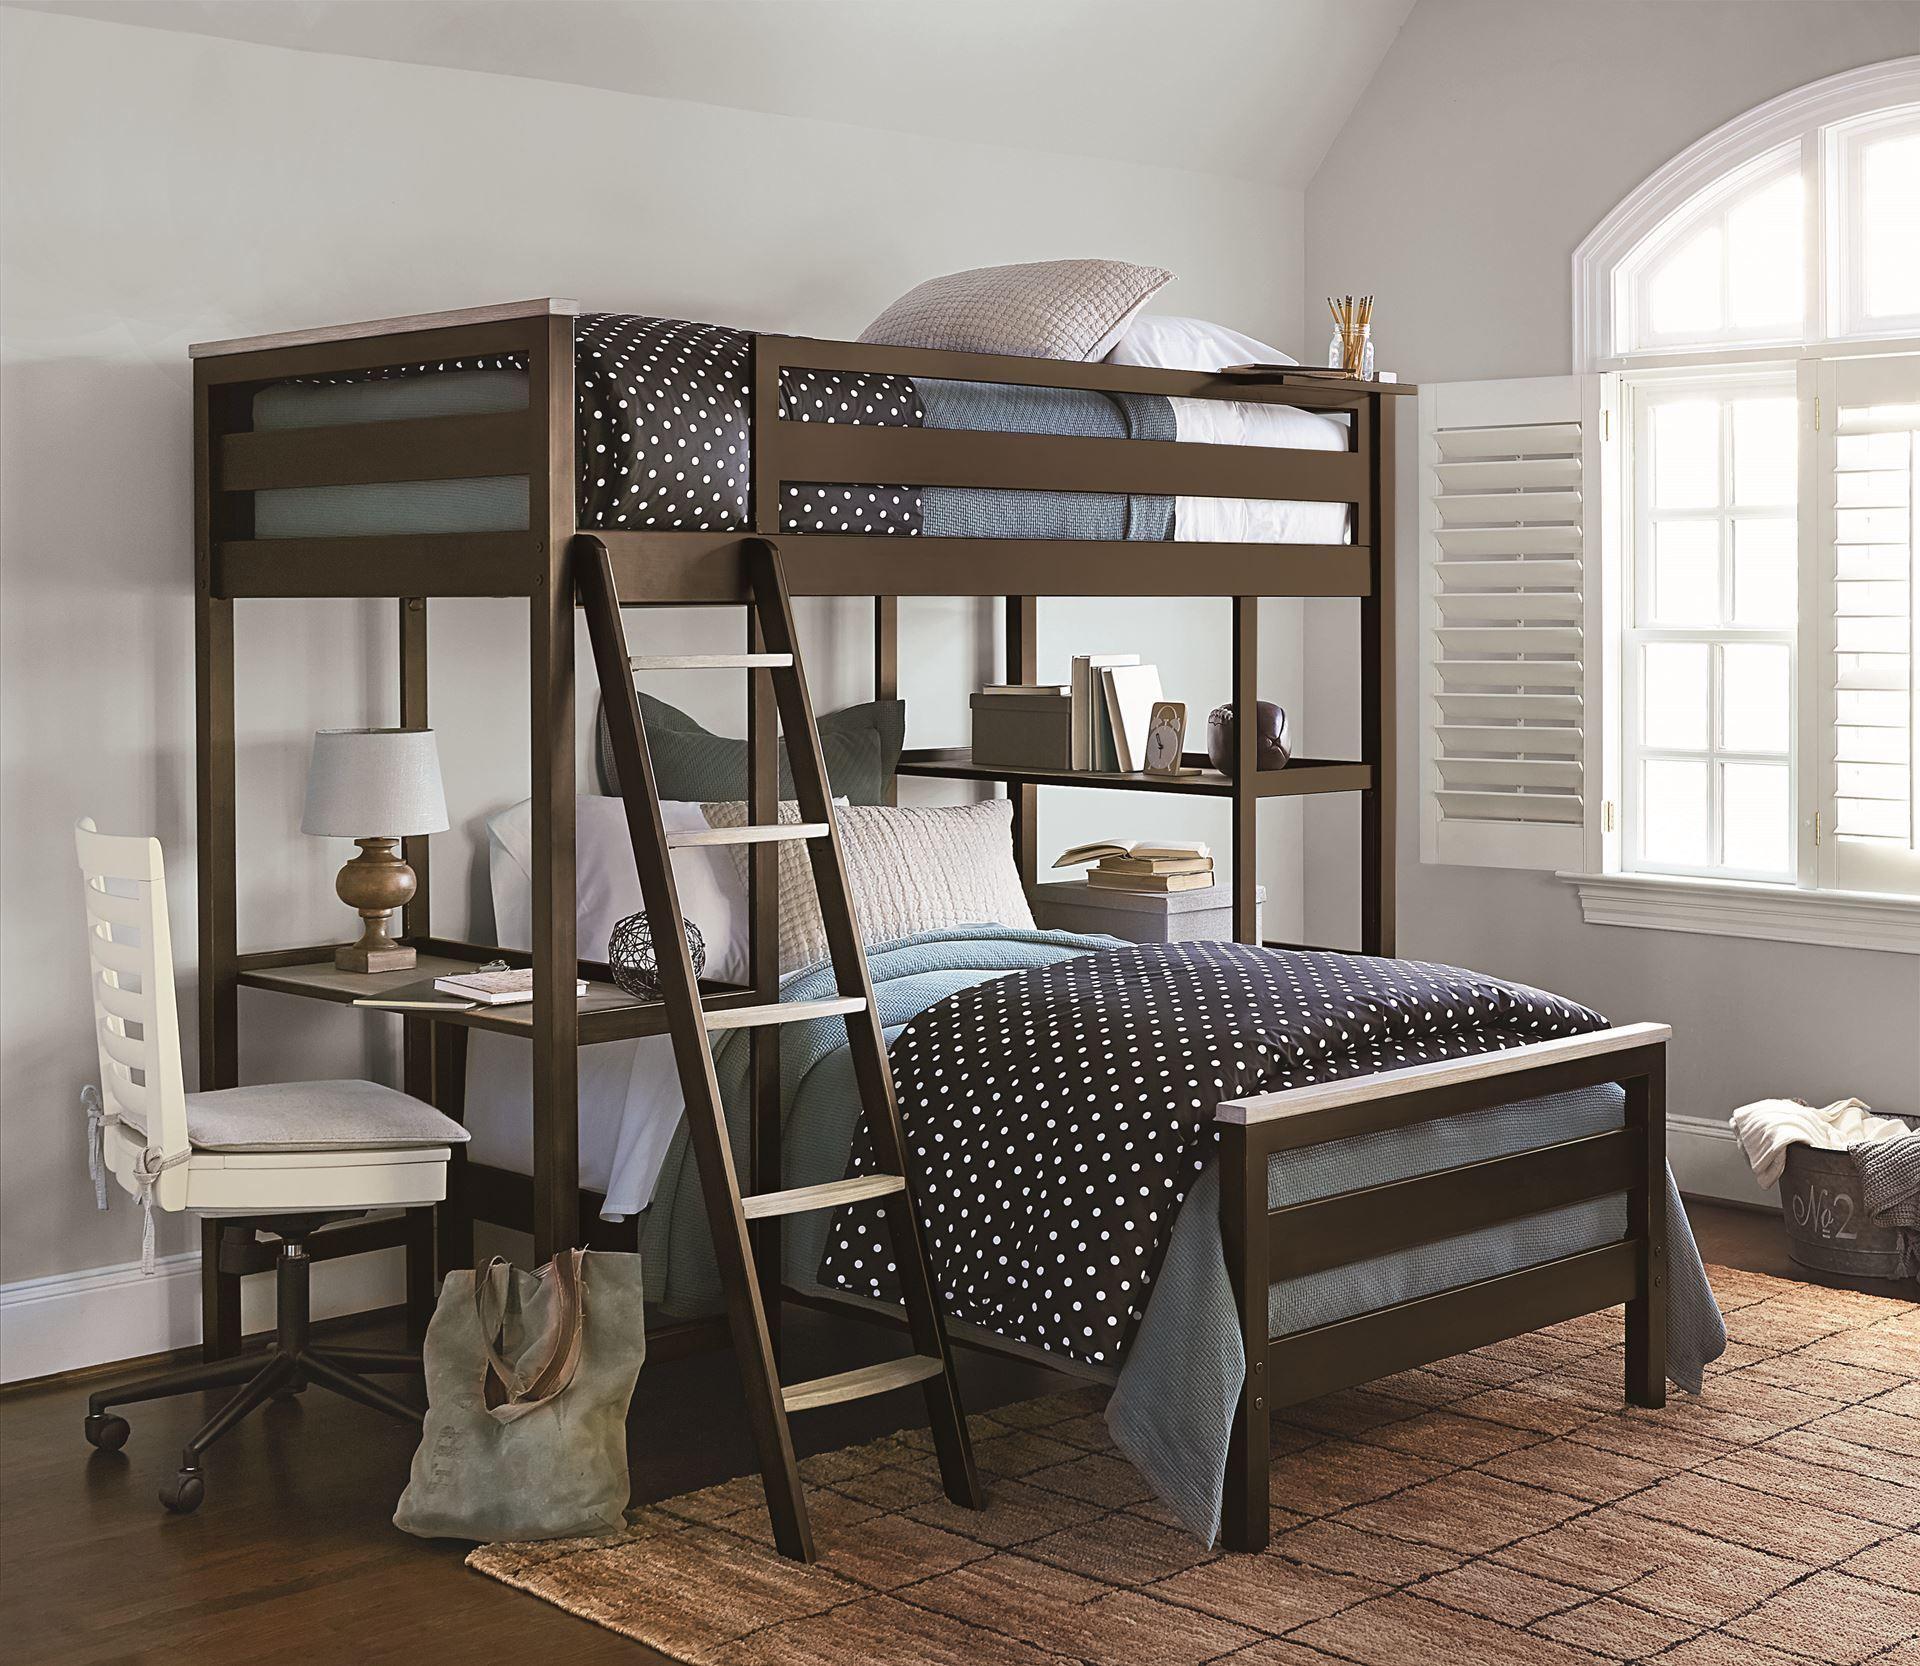 myRoom Bunk Bedroom Set (Parchment/ Gray) in 2020 Loft